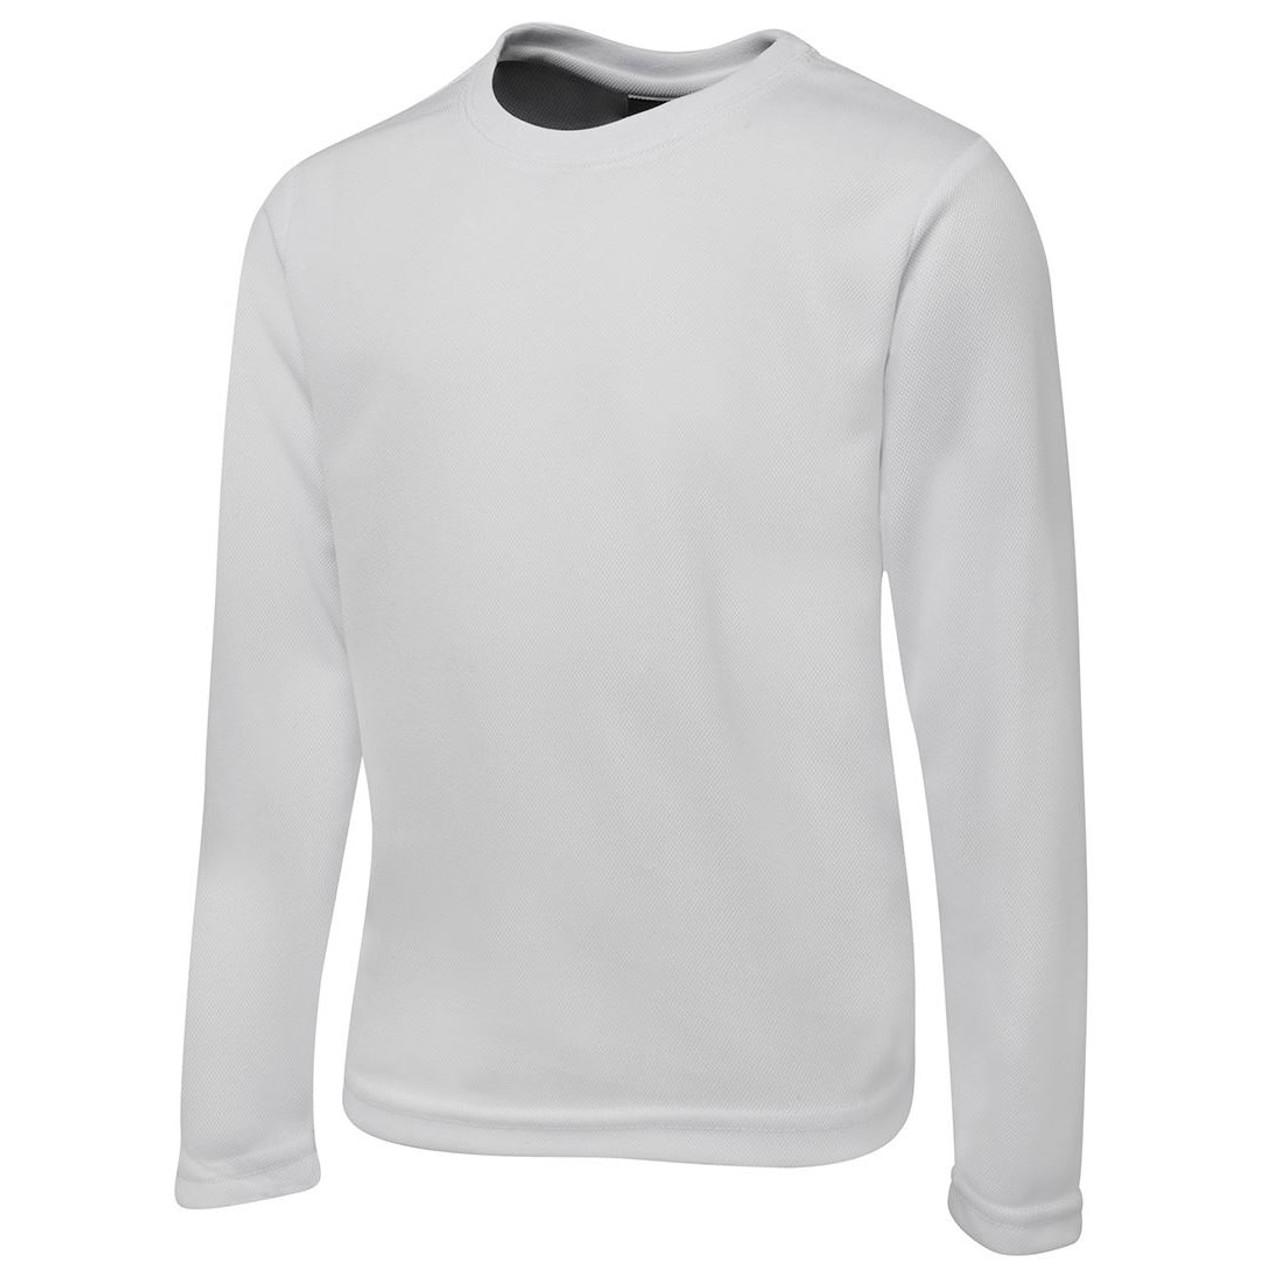 5e235c92 FANG | poly plain long sleeves tshirt | Wholesale T Shirts | Plus Size T- Shirts